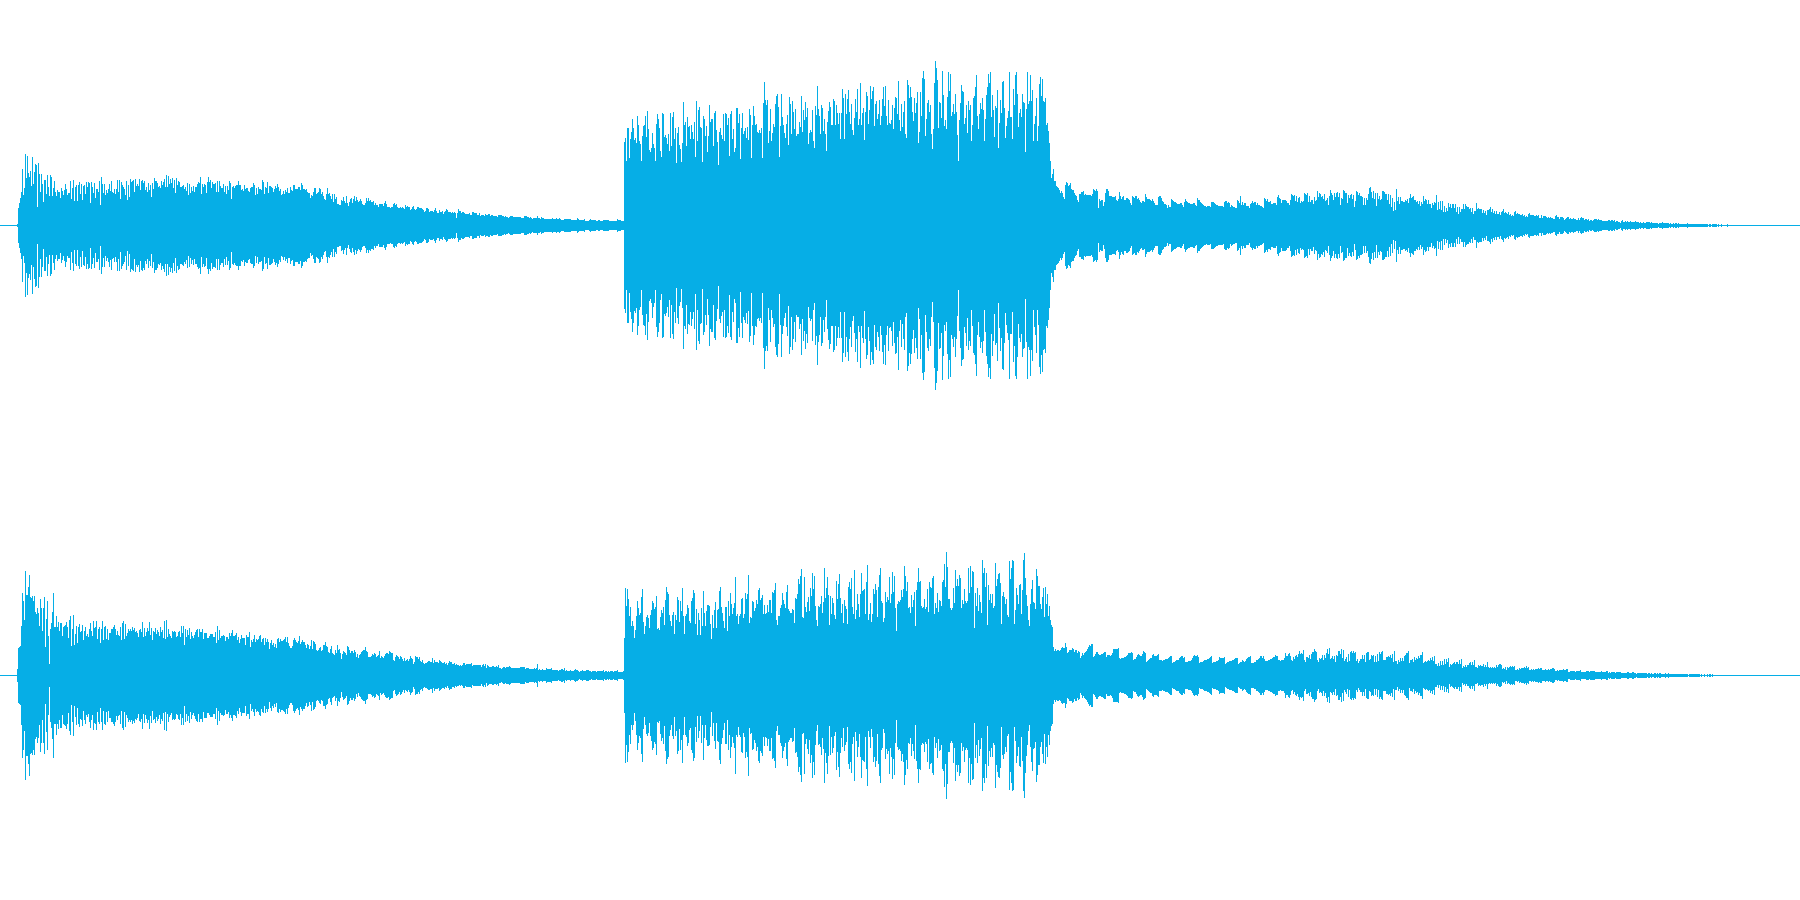 FI デバイス ライズフォール02の再生済みの波形